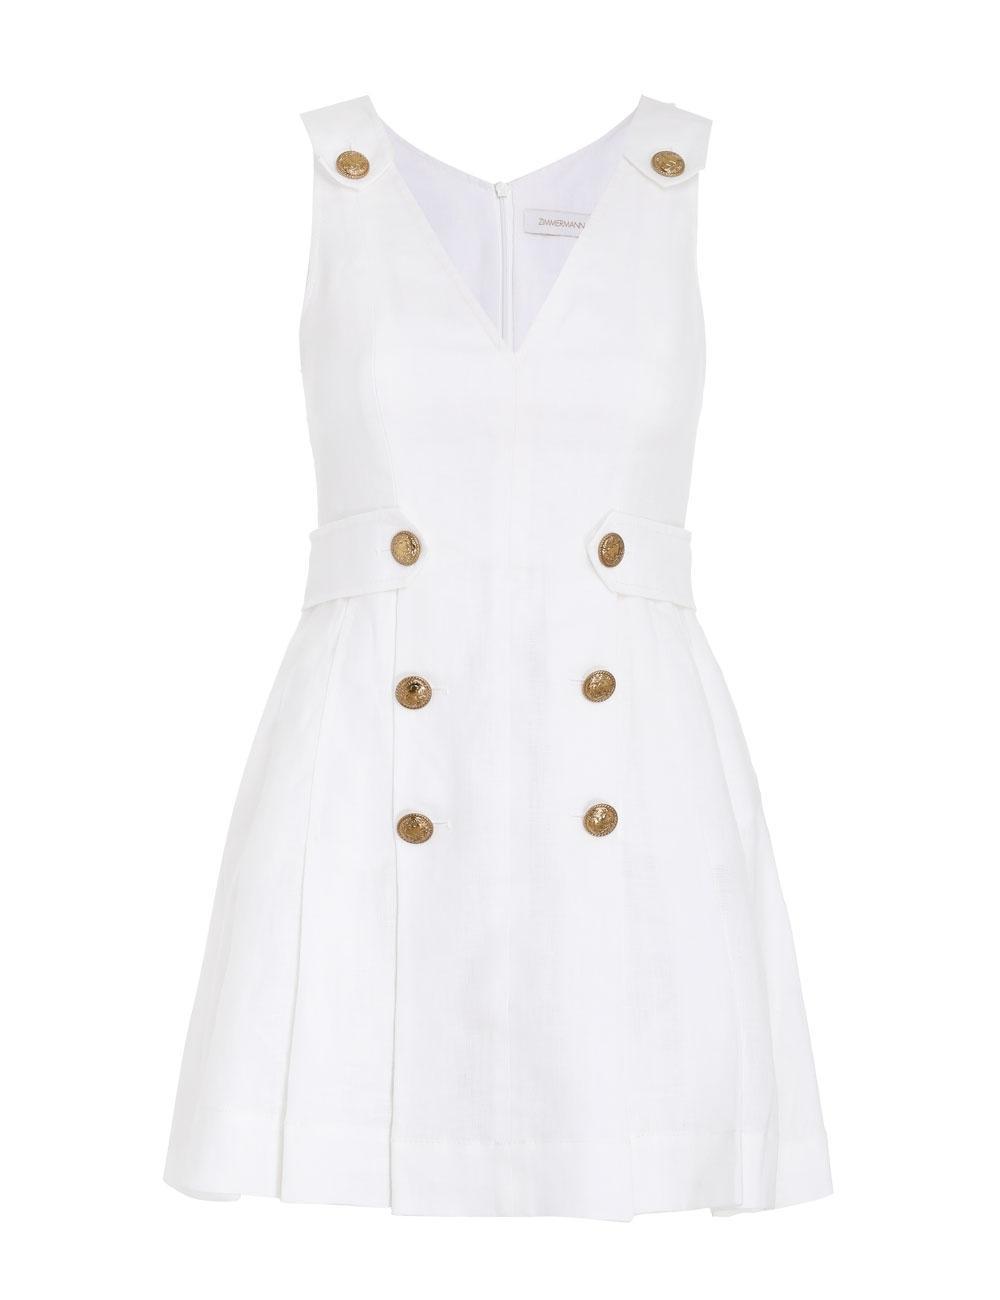 The Lovestruck Buttoned Mini Dress